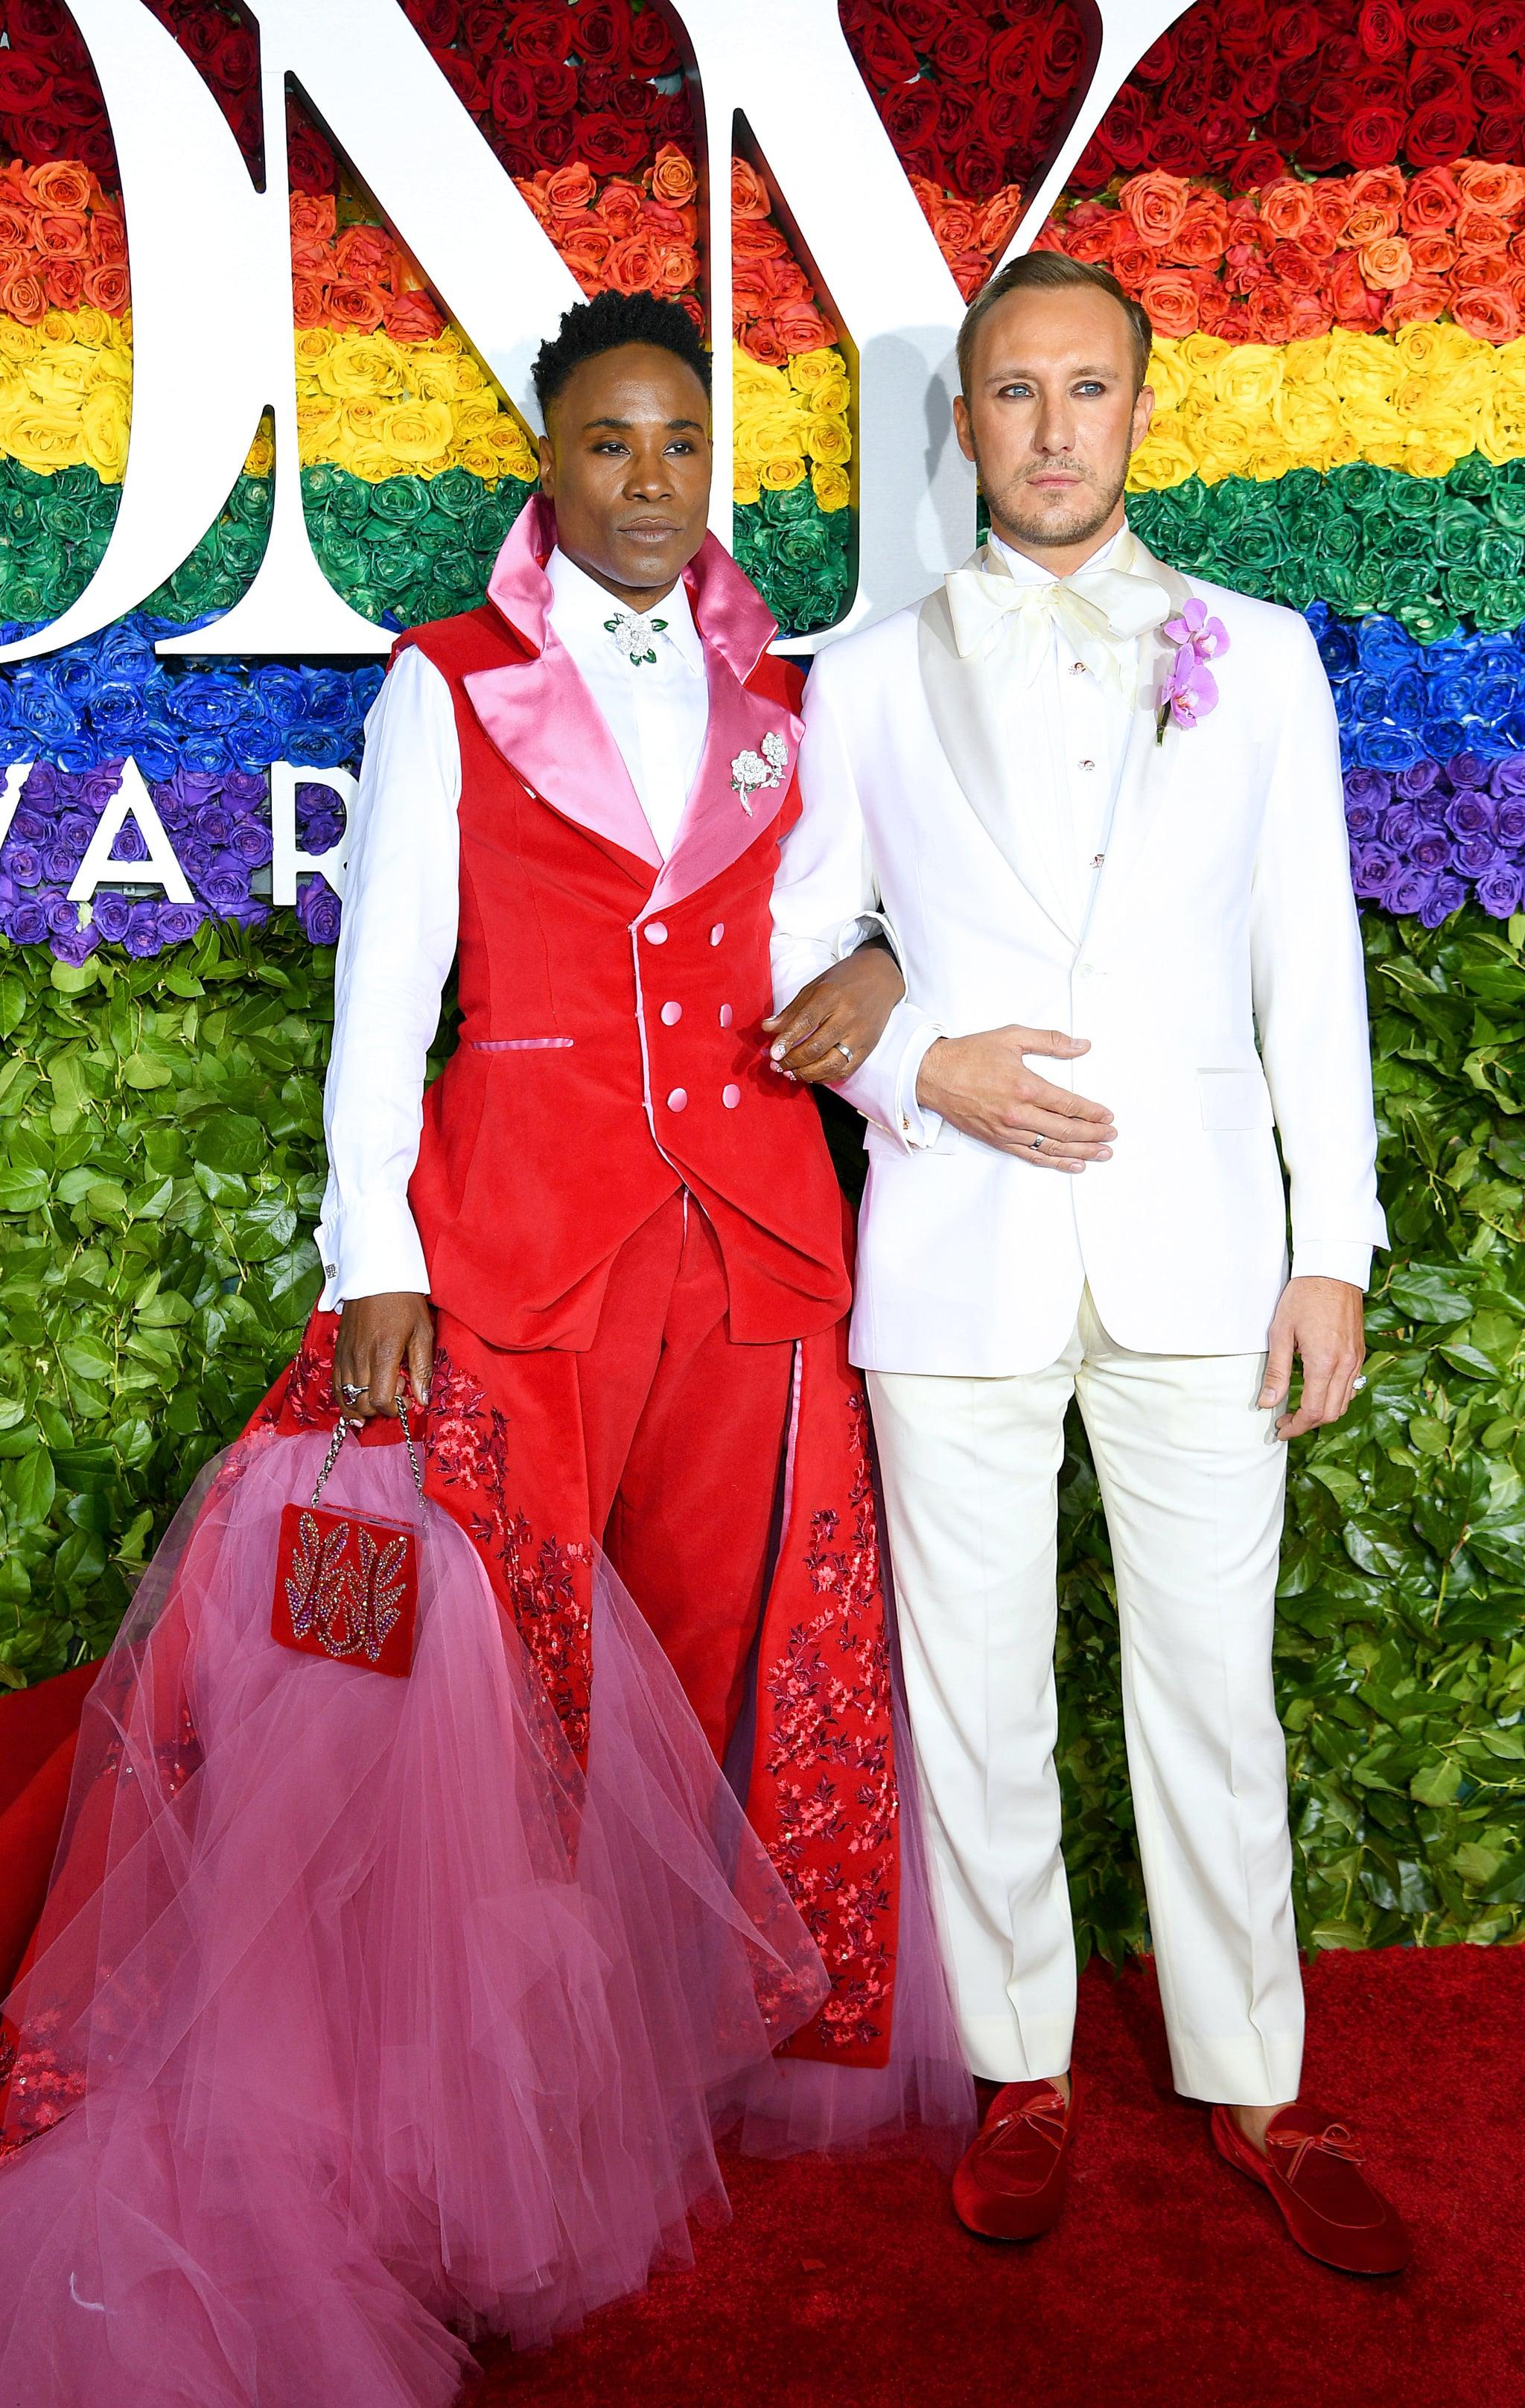 Fashion, Shopping & Style | If I Bow Down to Billy Porter's Tony Awards Skirt, I Might Never Get Back Up | POPSUGAR Fashion Photo 14